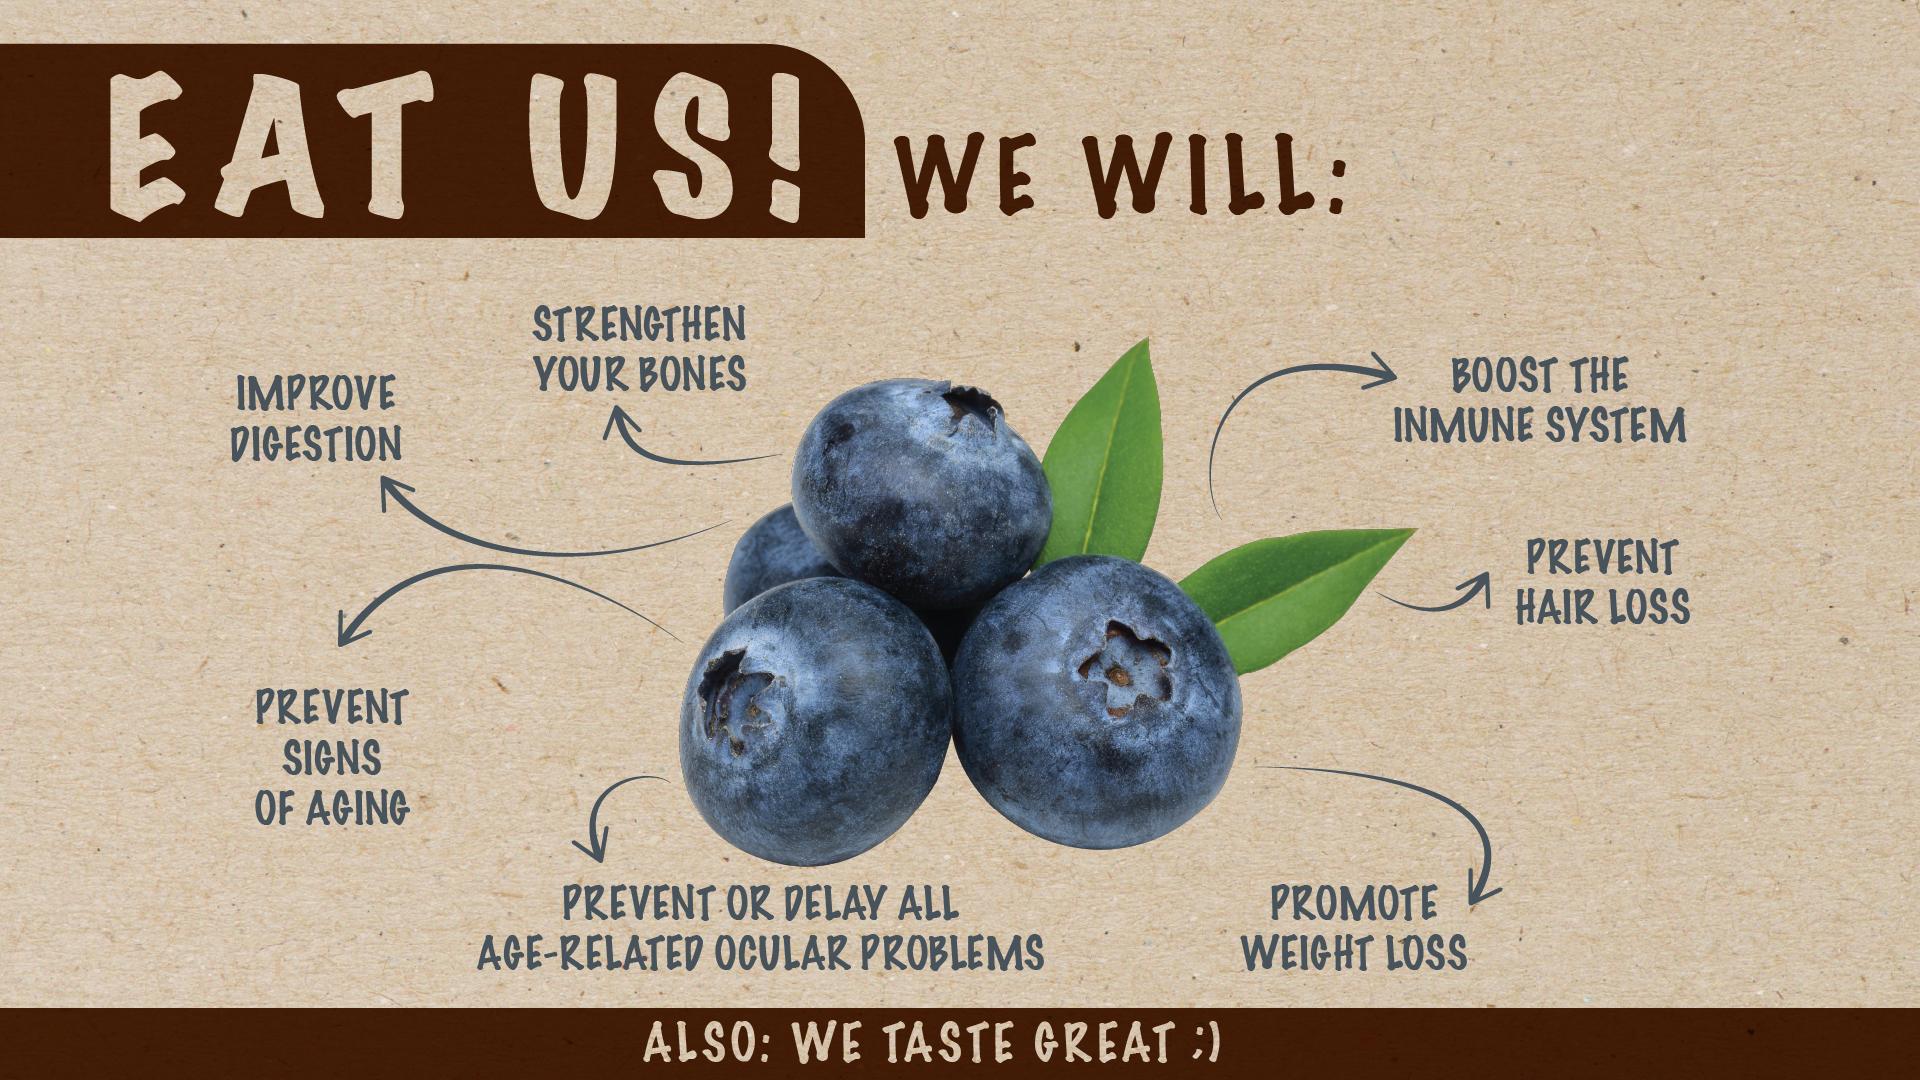 Eat us! Blueberries